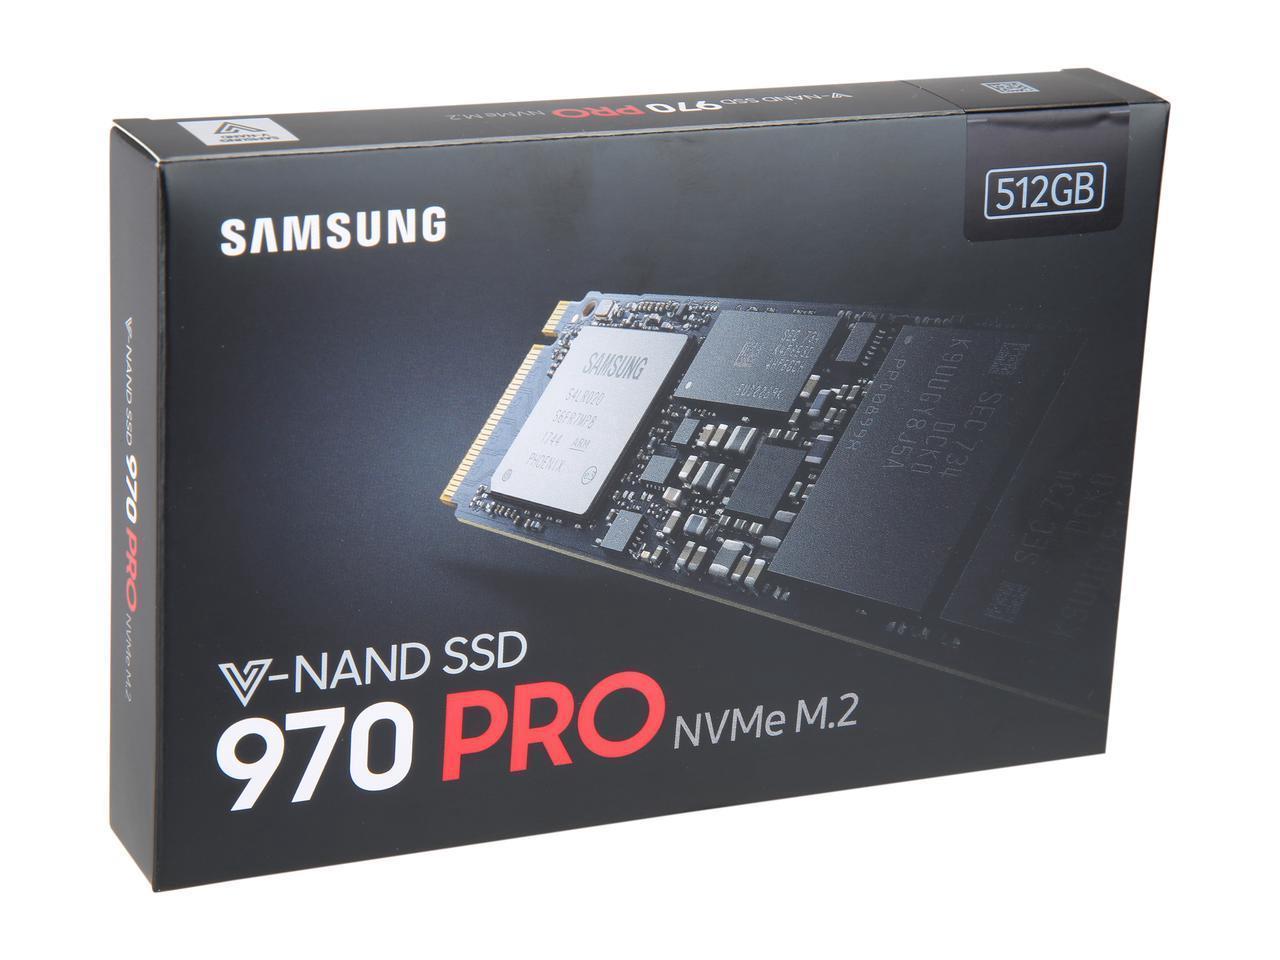 Image result for 5- Samsung SSD 970 Pro: